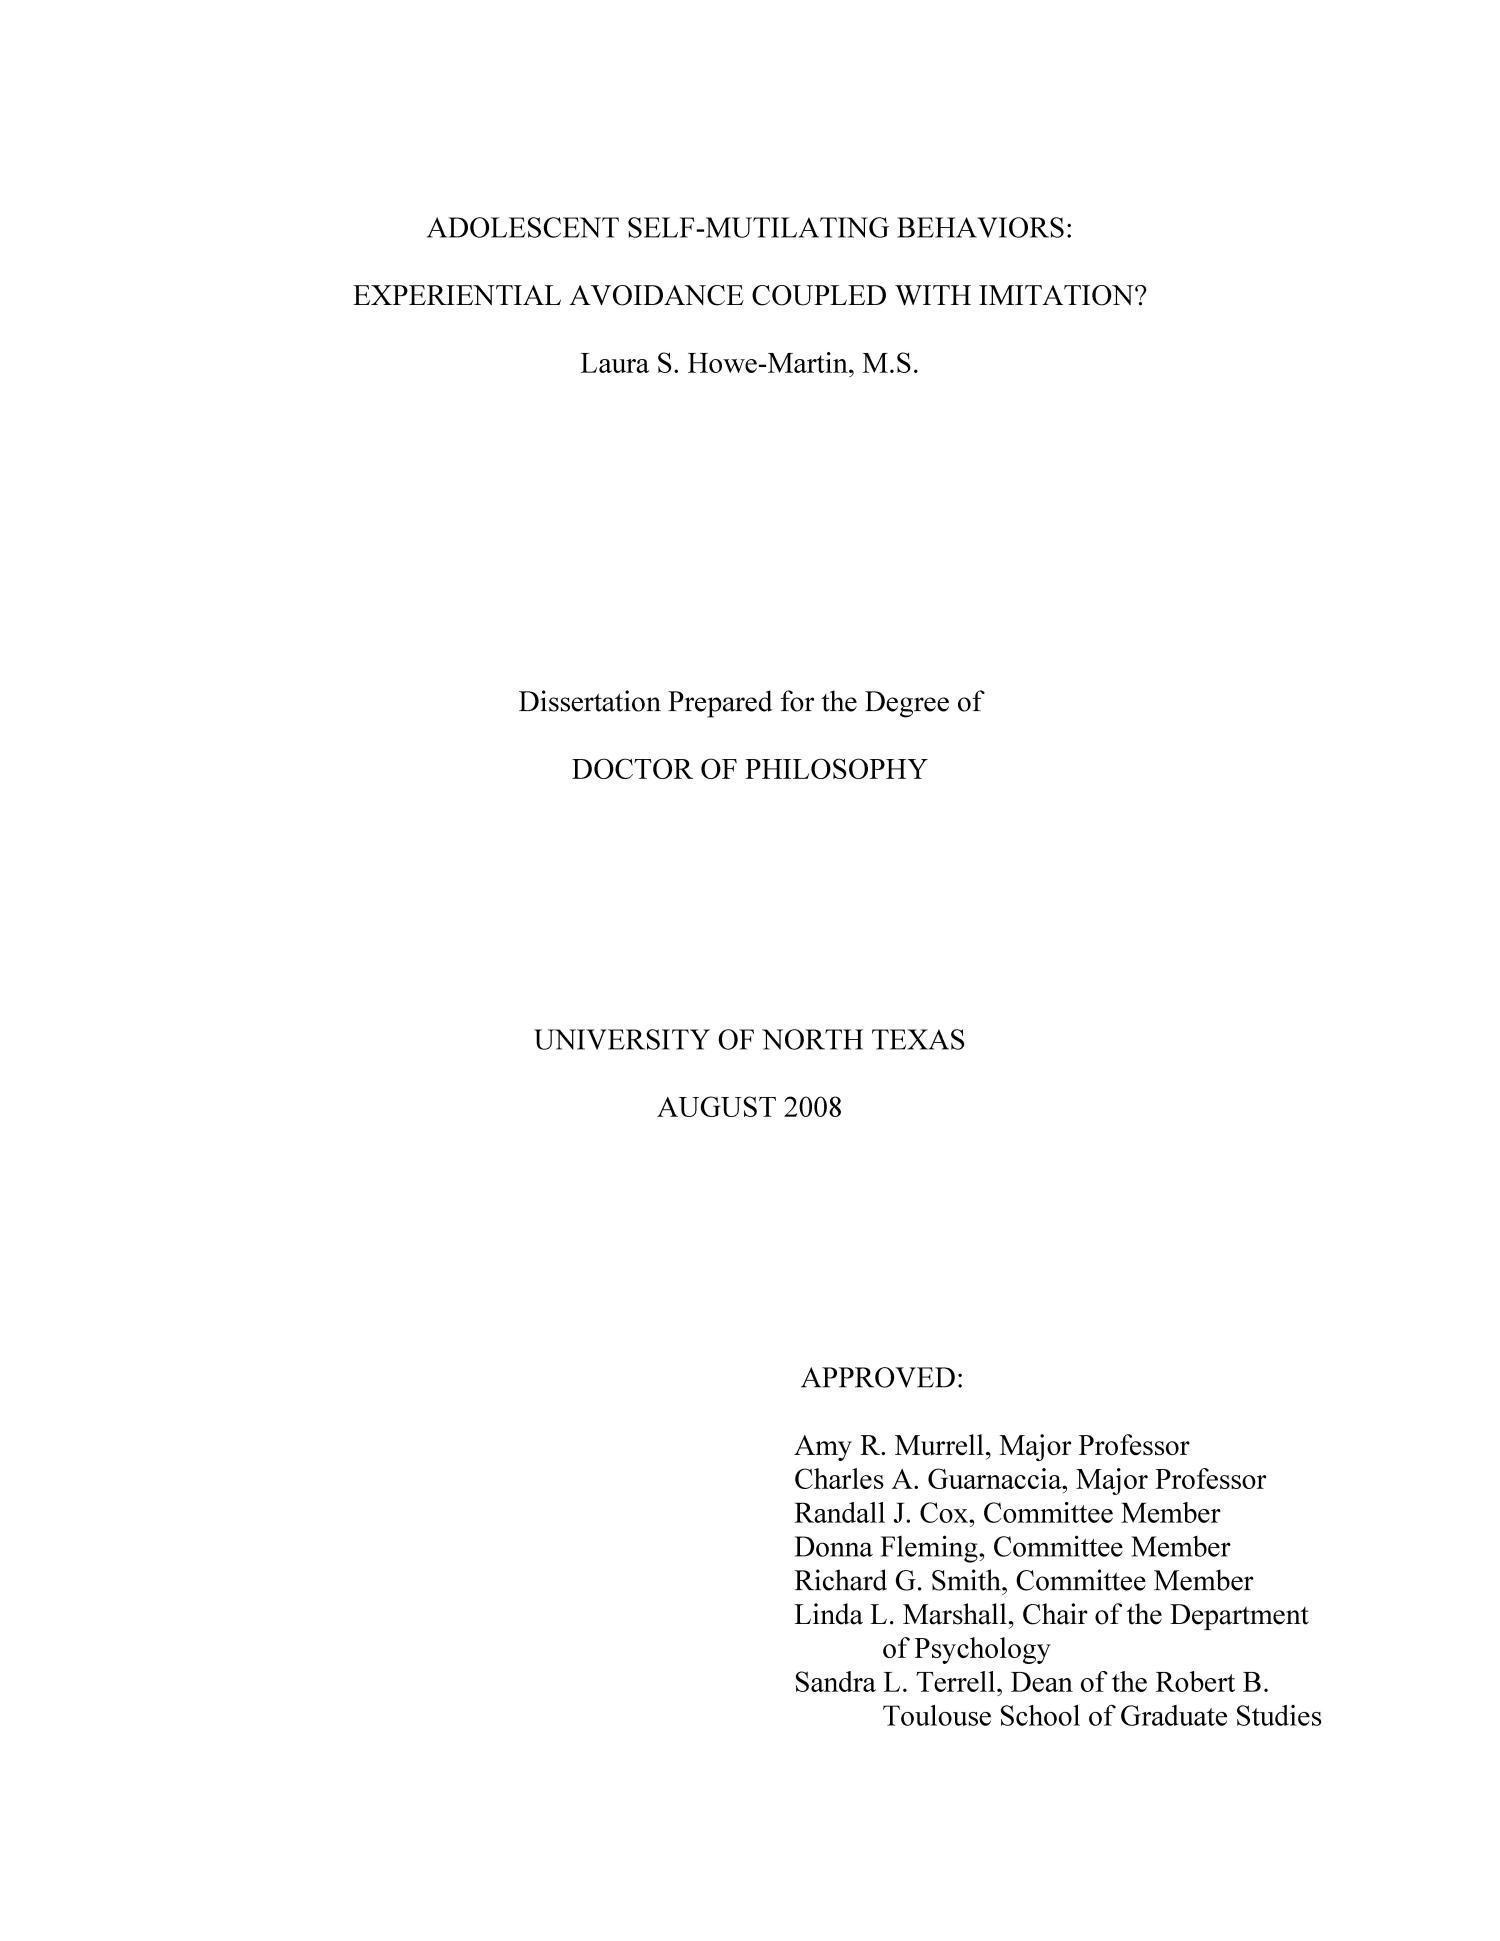 Dissertation avoidance